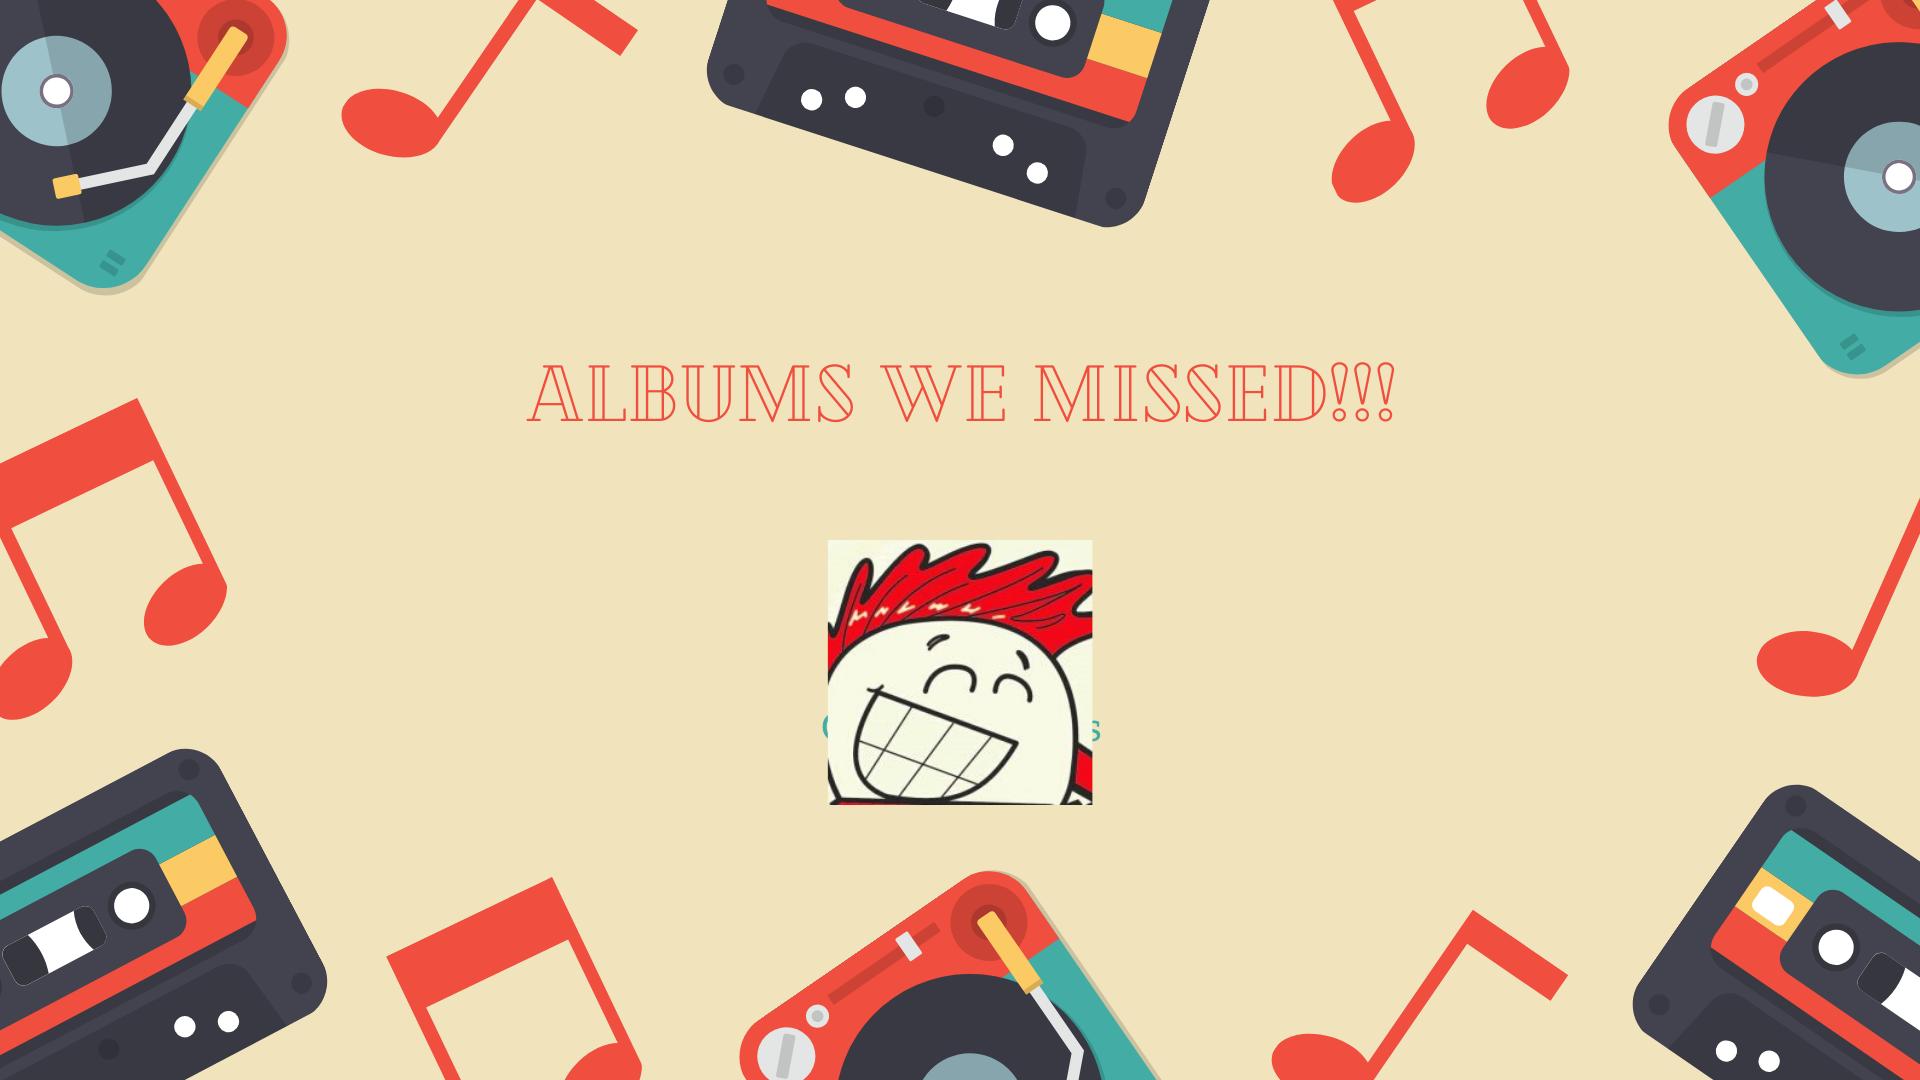 Colorful Music Cassette Illustrated Retro Desktop Wallpaper